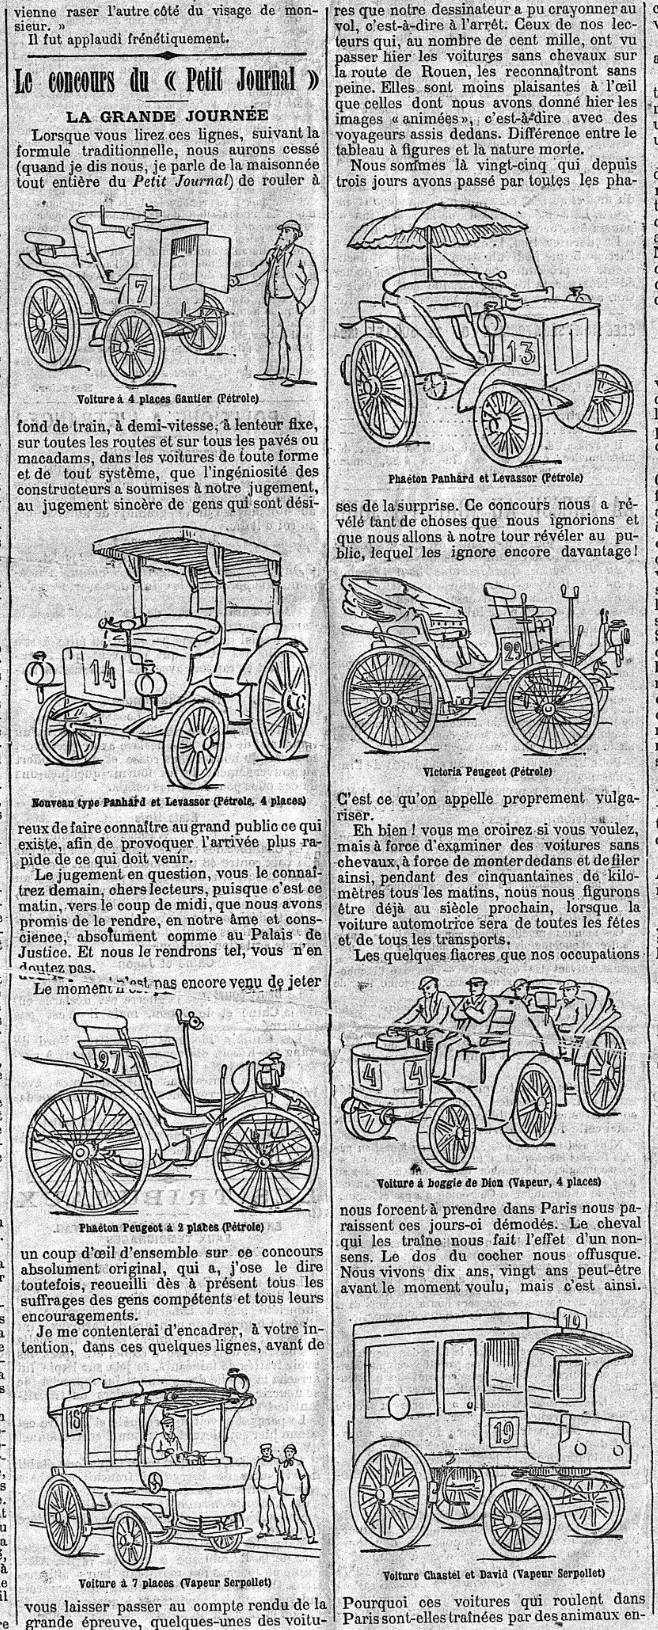 1894-07-23 1 -